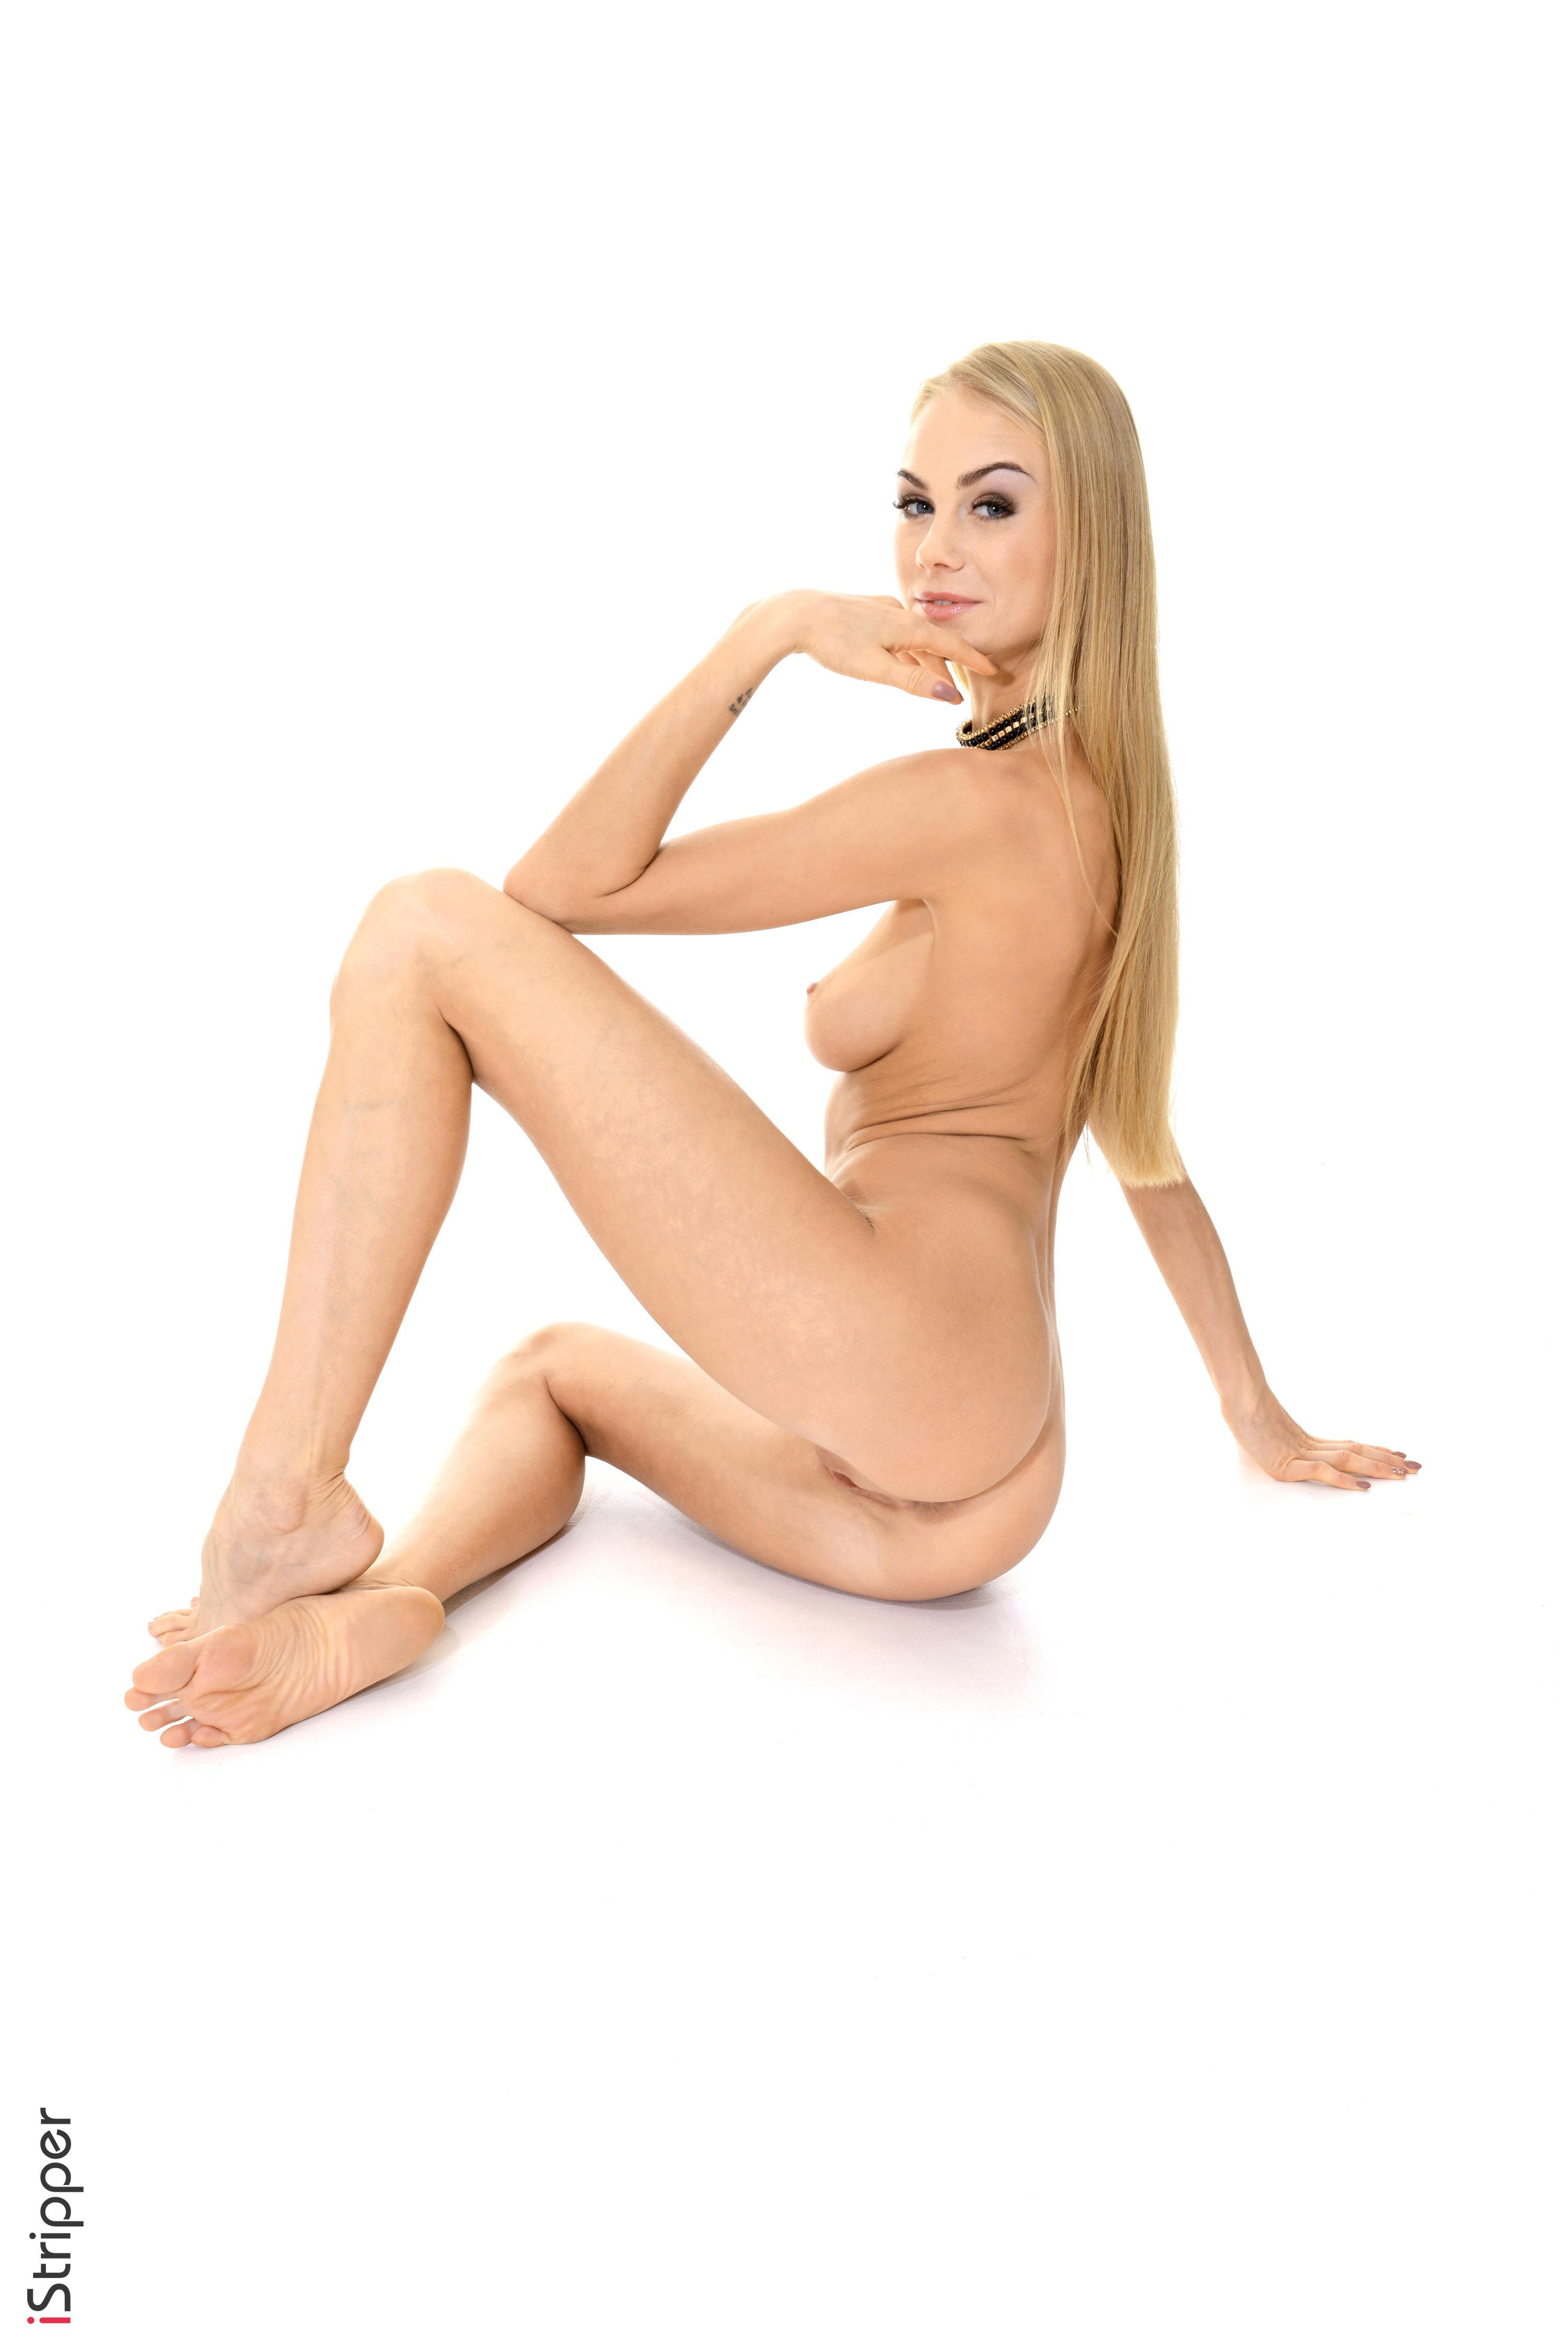 full hd nude girls wallpaper